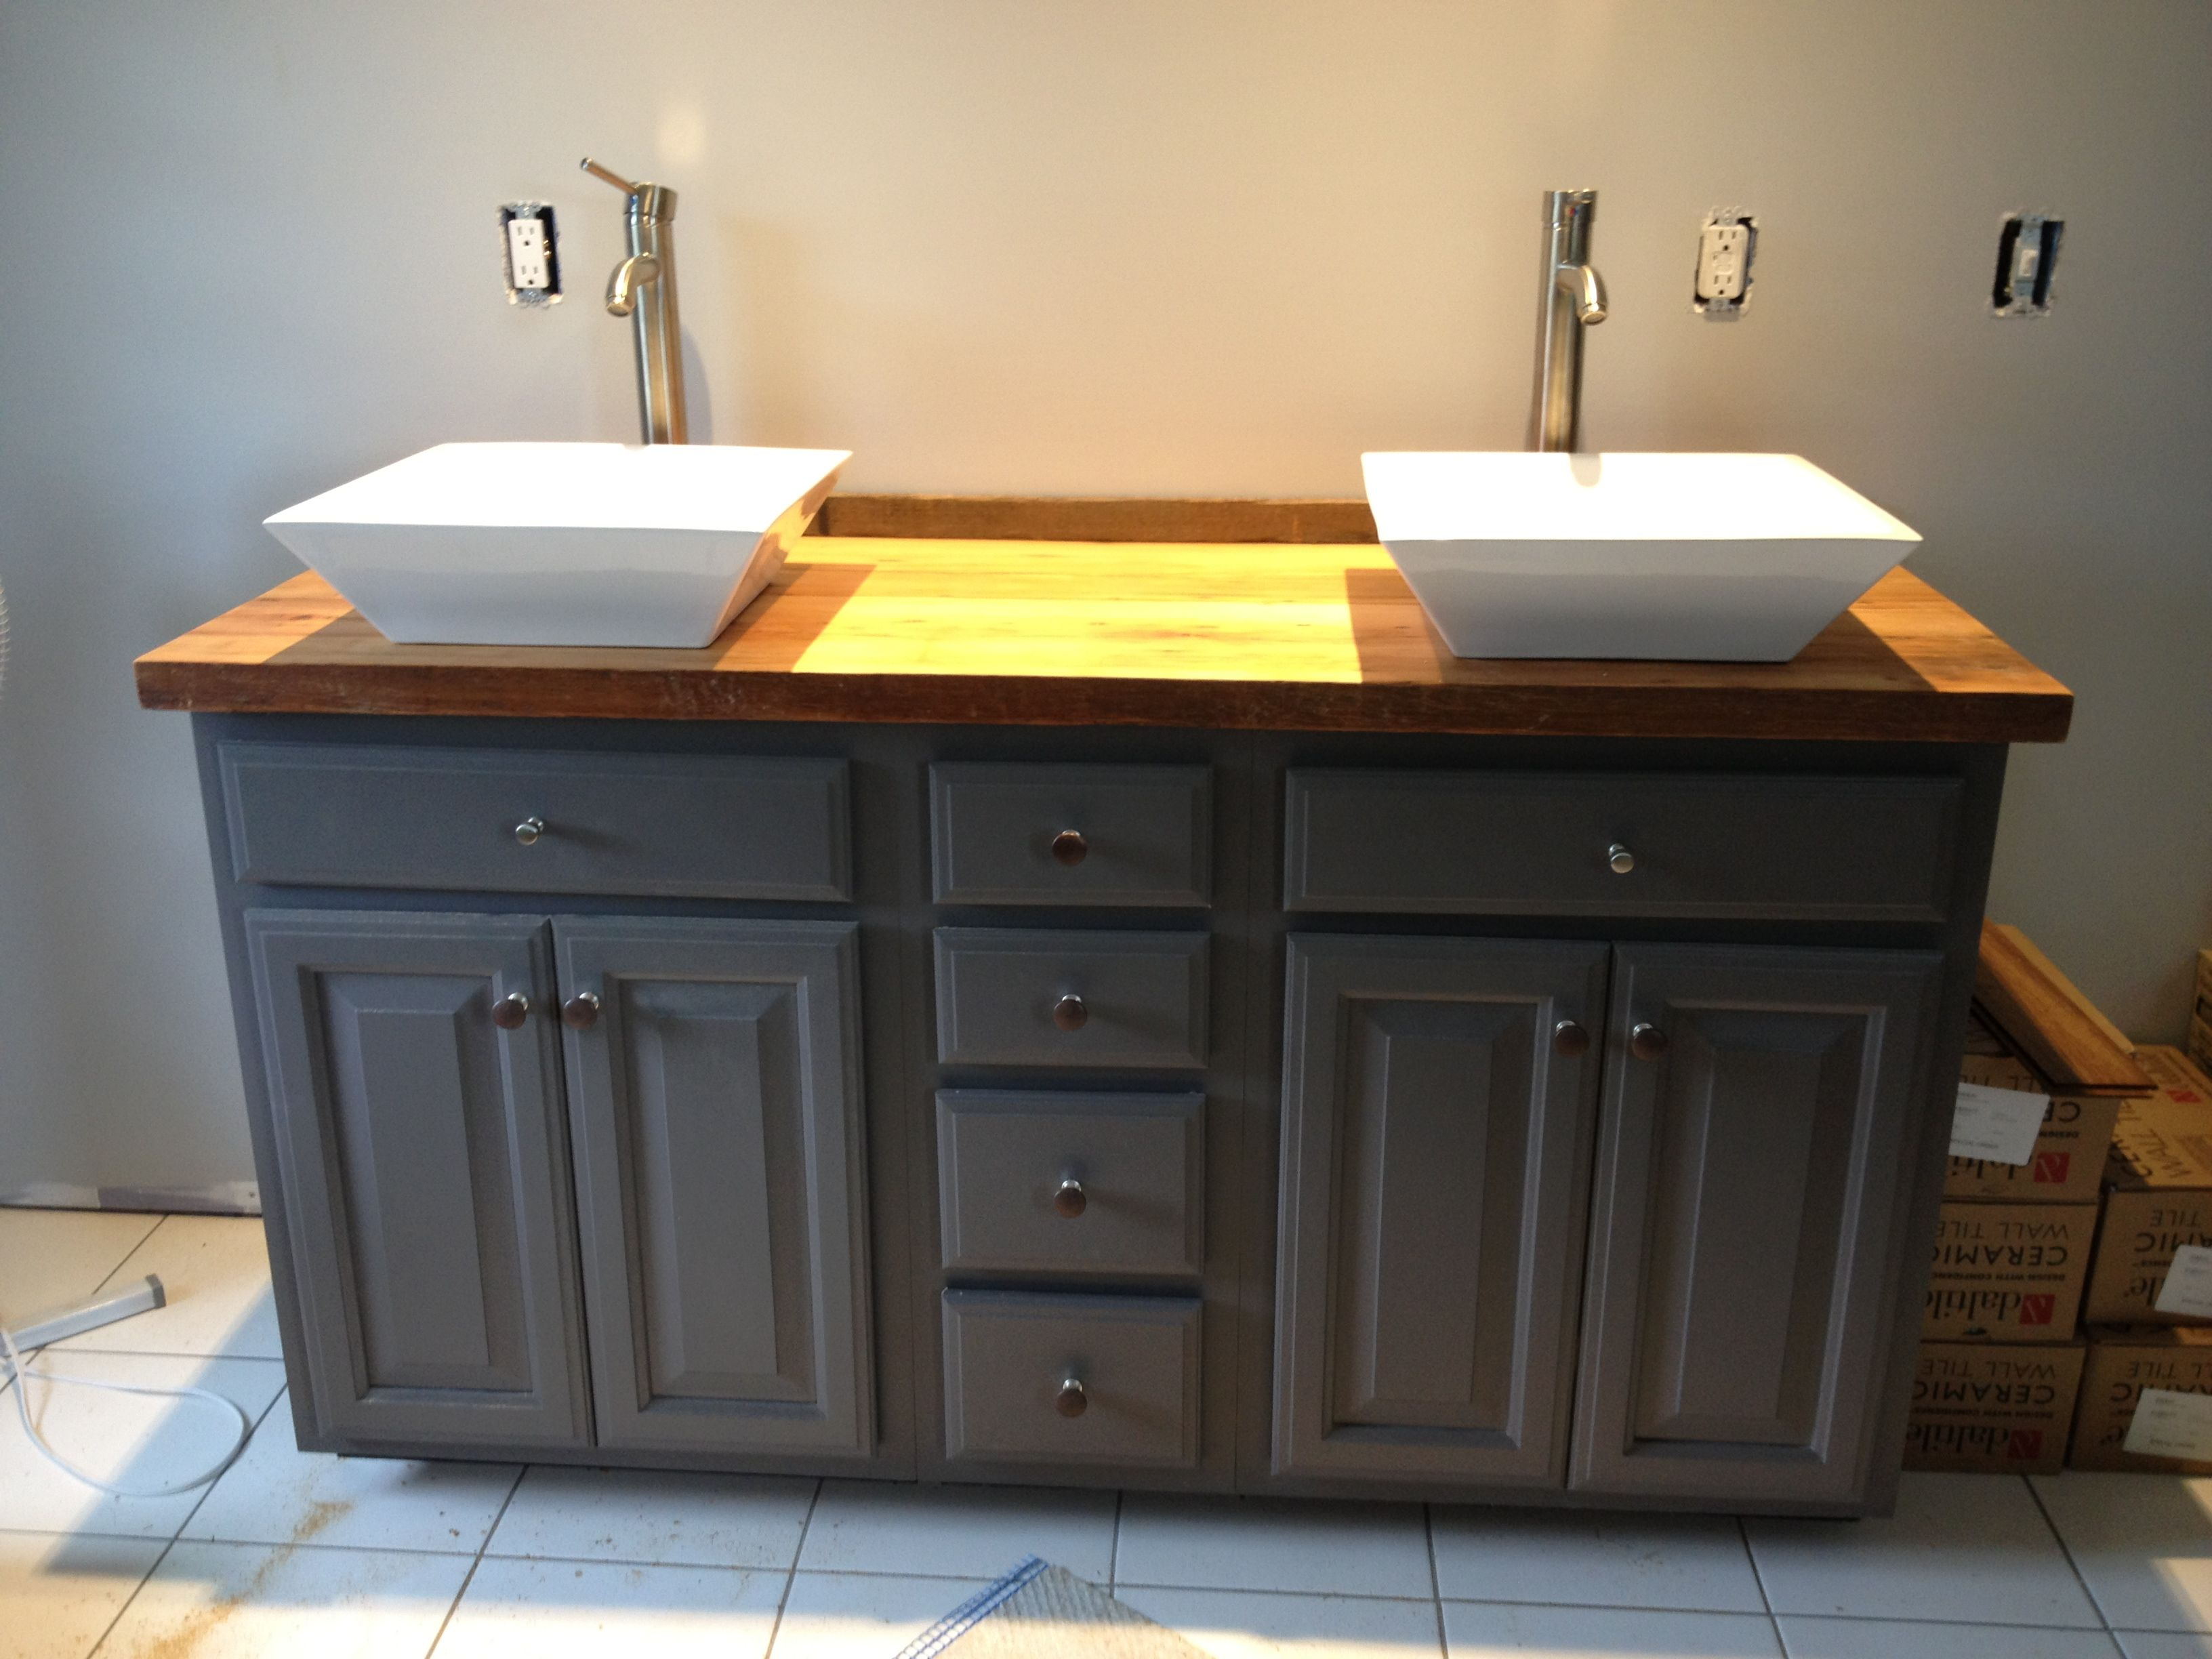 Looking For Used Kitchen Cabinets Grey Blinds Diy Bathroom Vanity The Barn Wood Hemlock Pieces